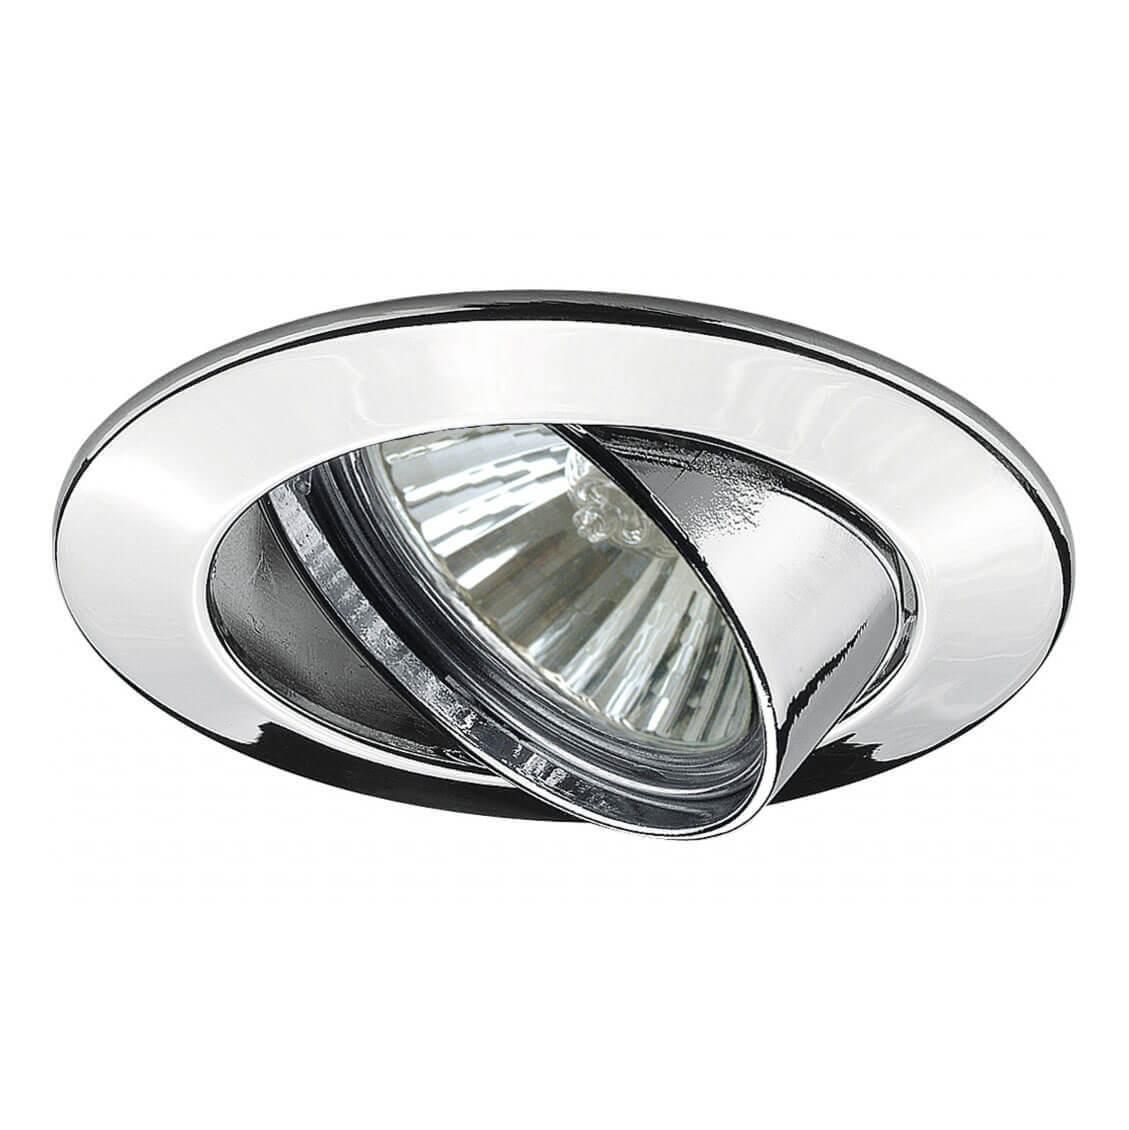 Светильник Paulmann 98943 Downlights Premium